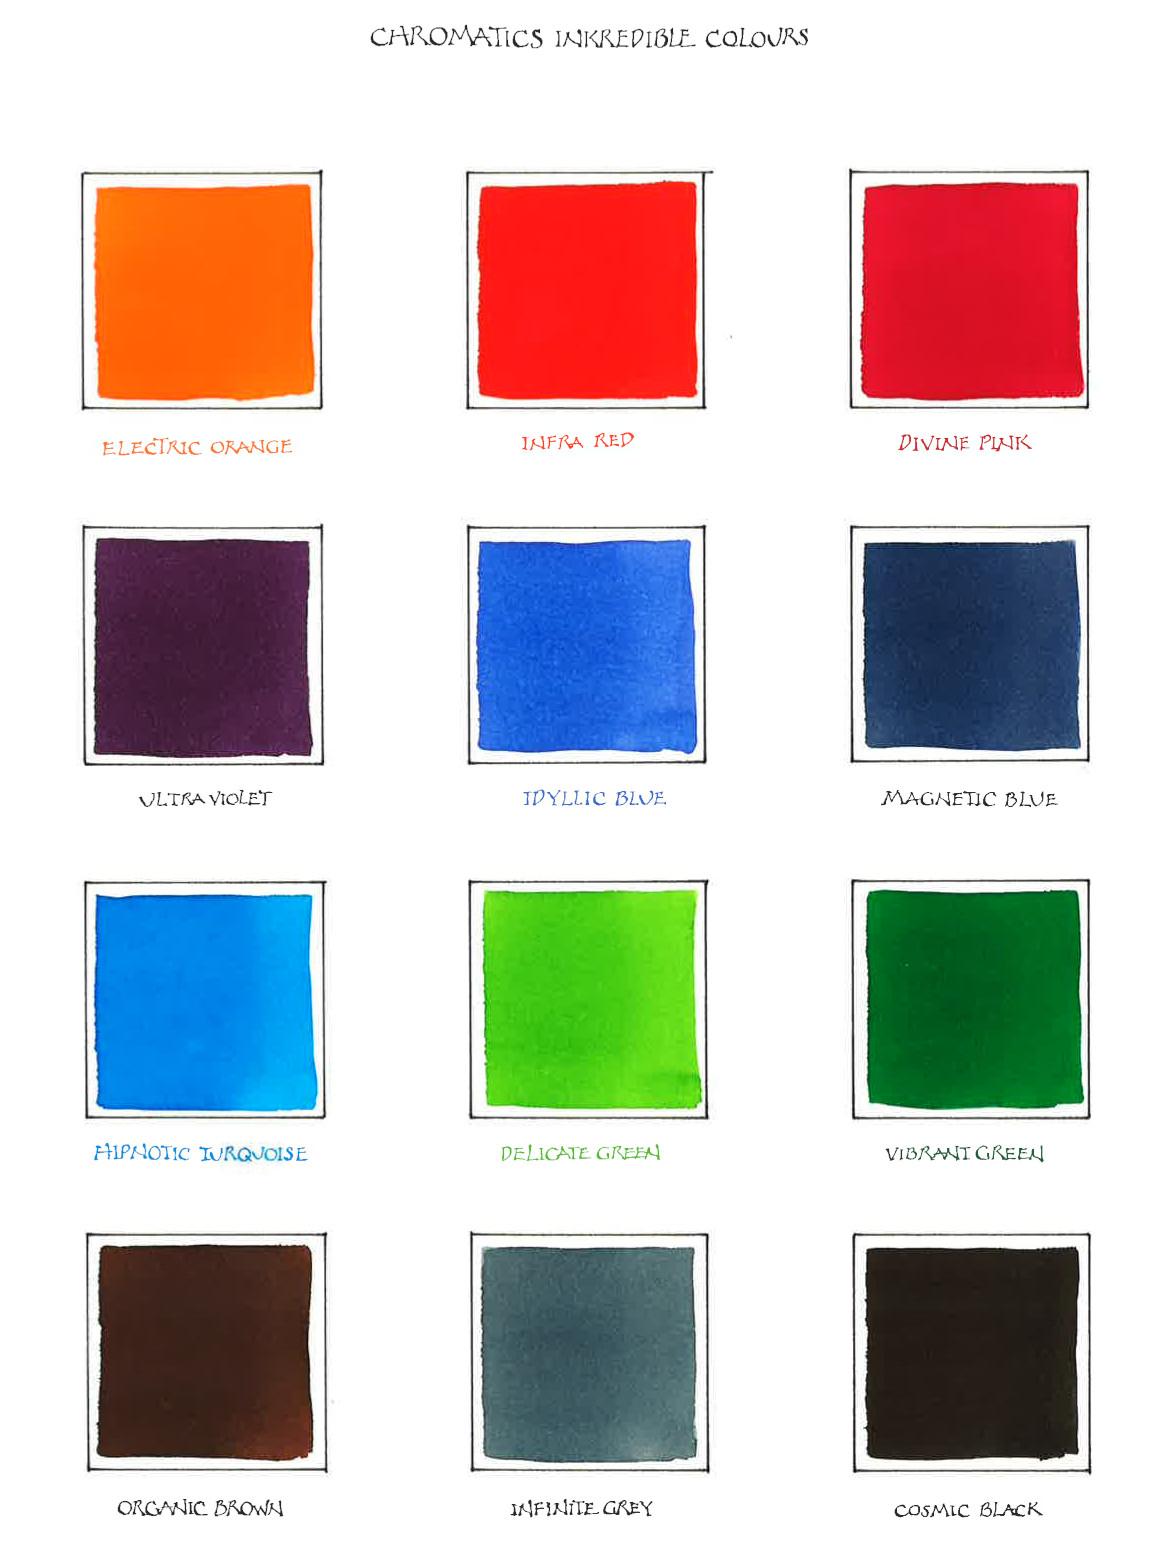 Caran D'Ache Chromatics Ink colour chart